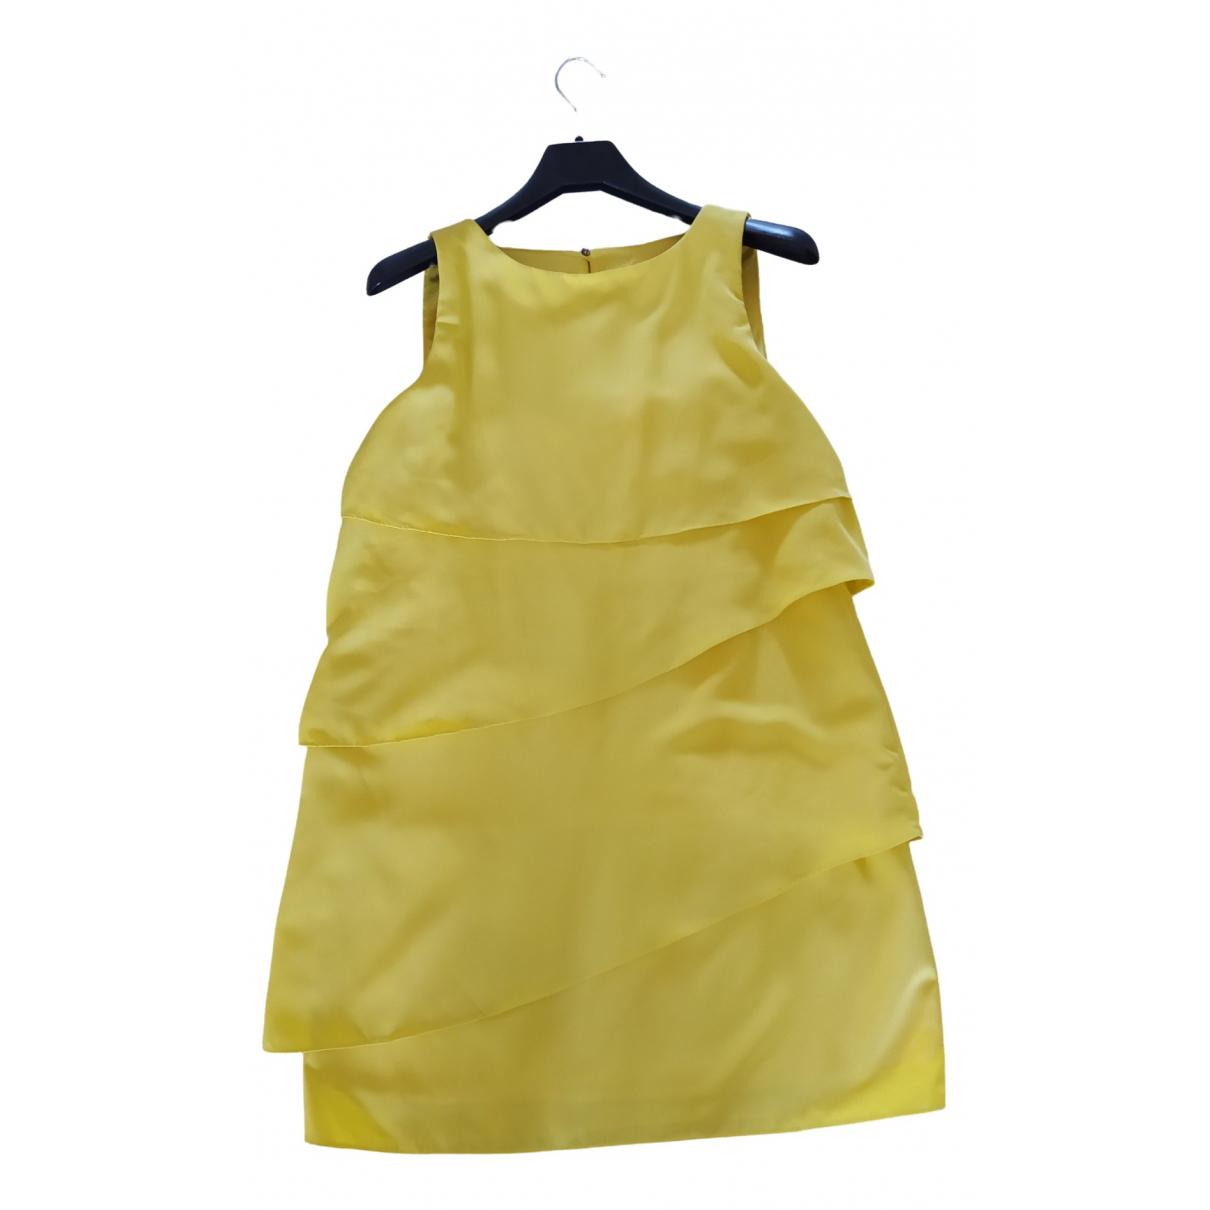 Zara \N Yellow dress for Women 44 FR